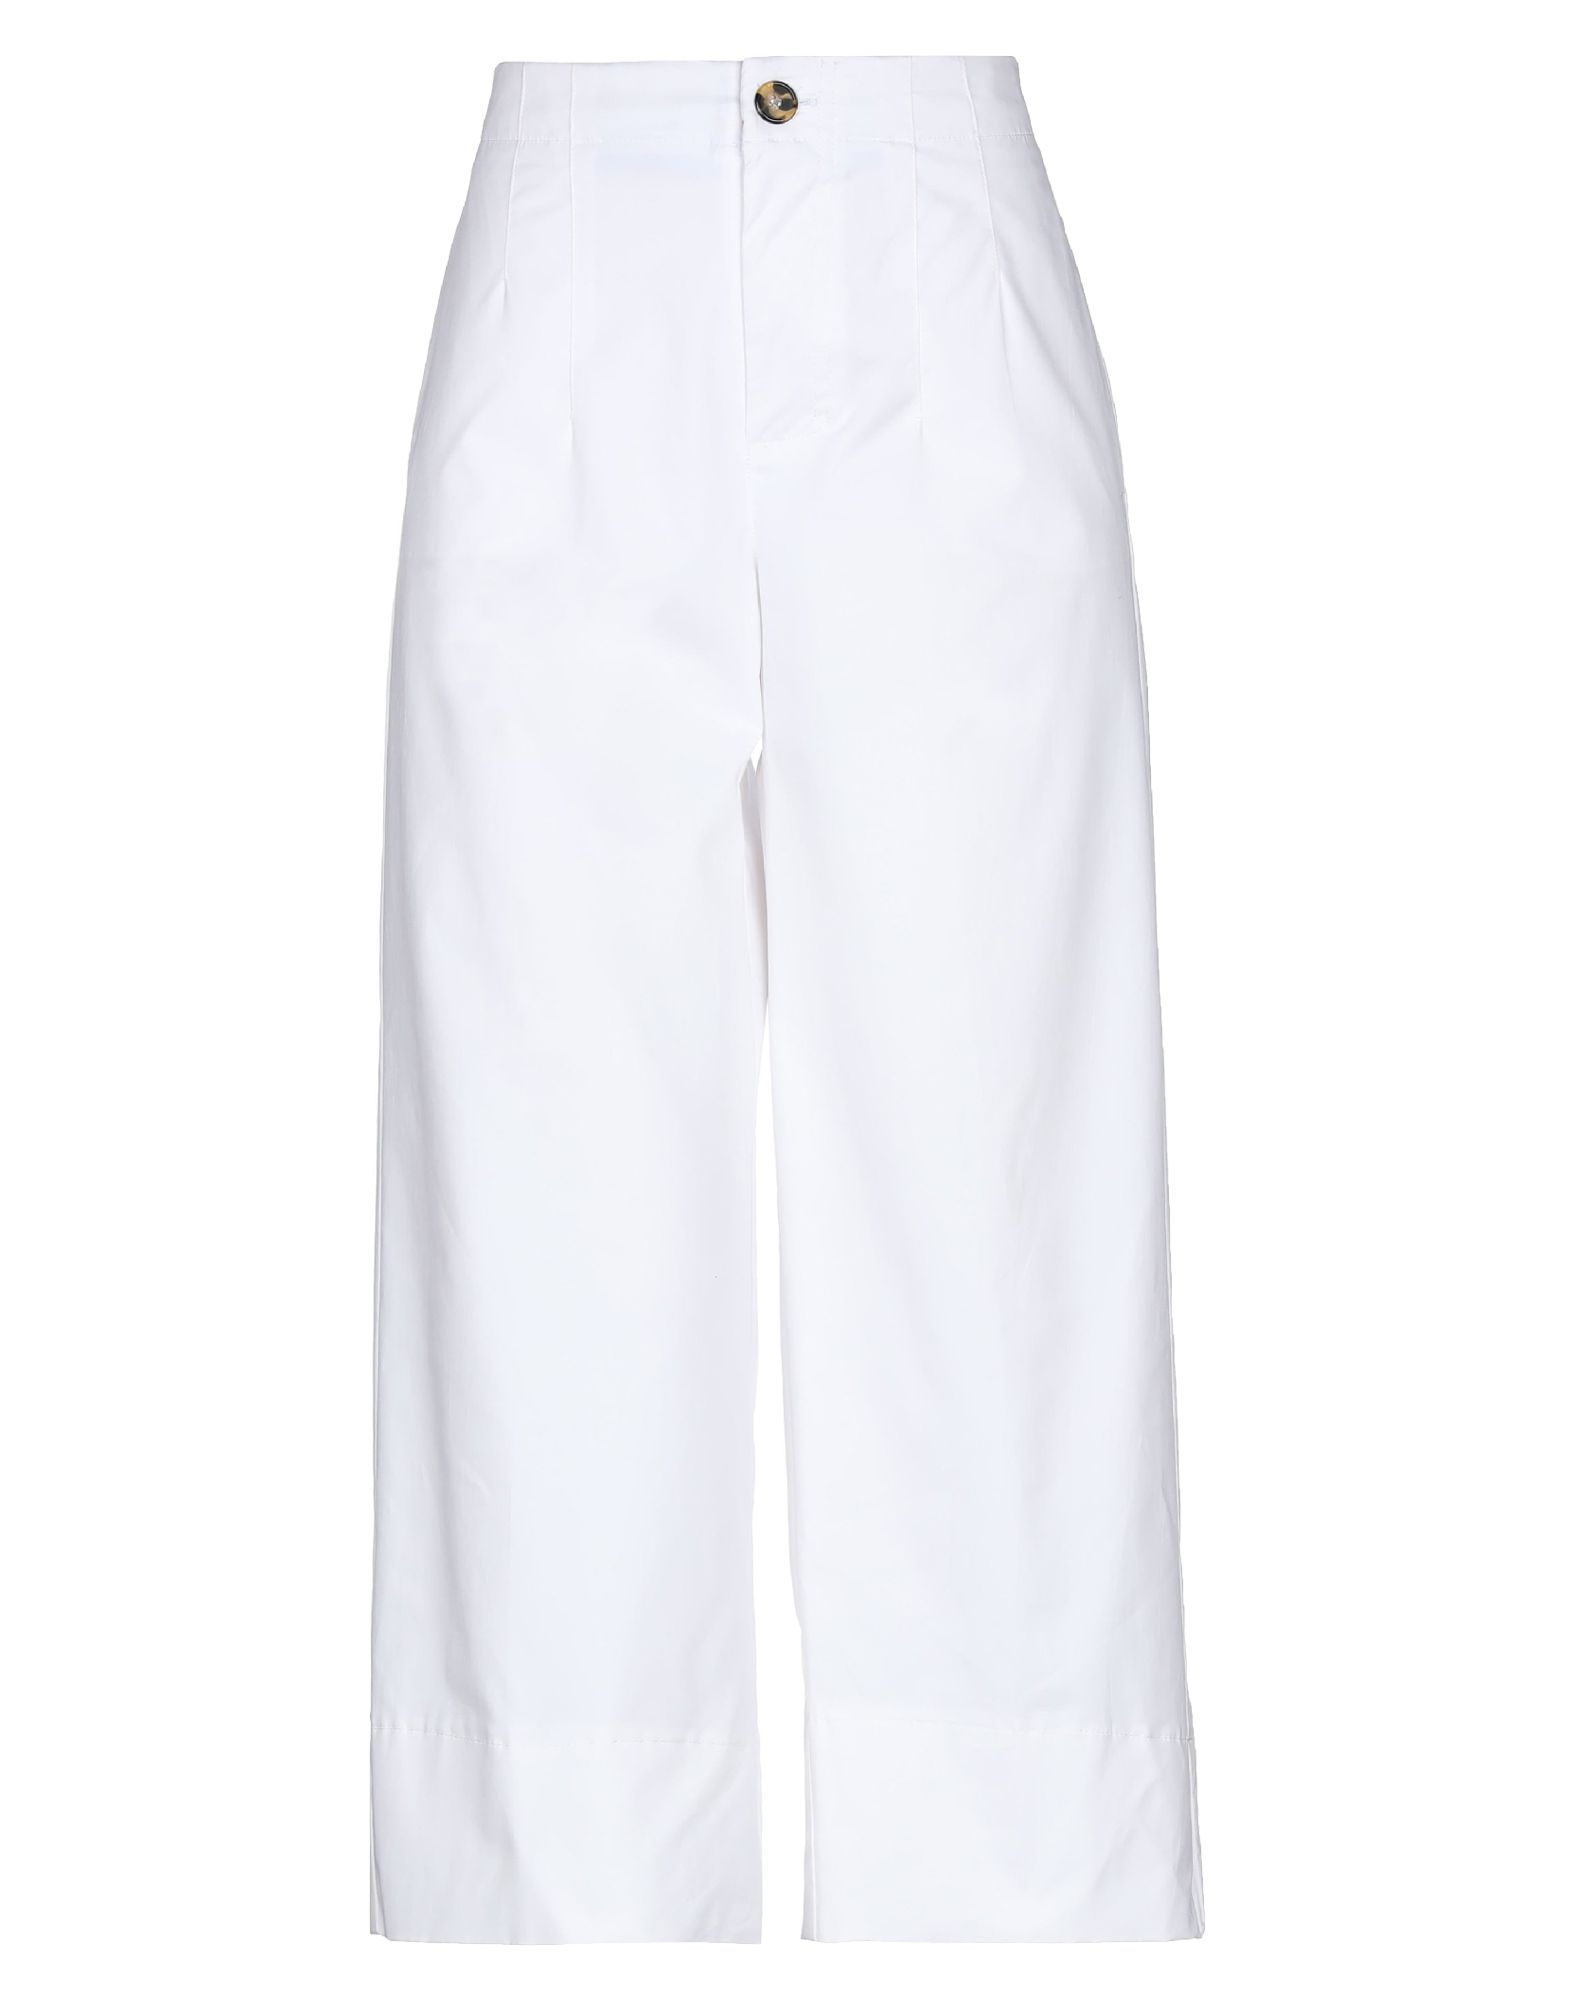 KATE BY LALTRAMODA Повседневные брюки цена 2017